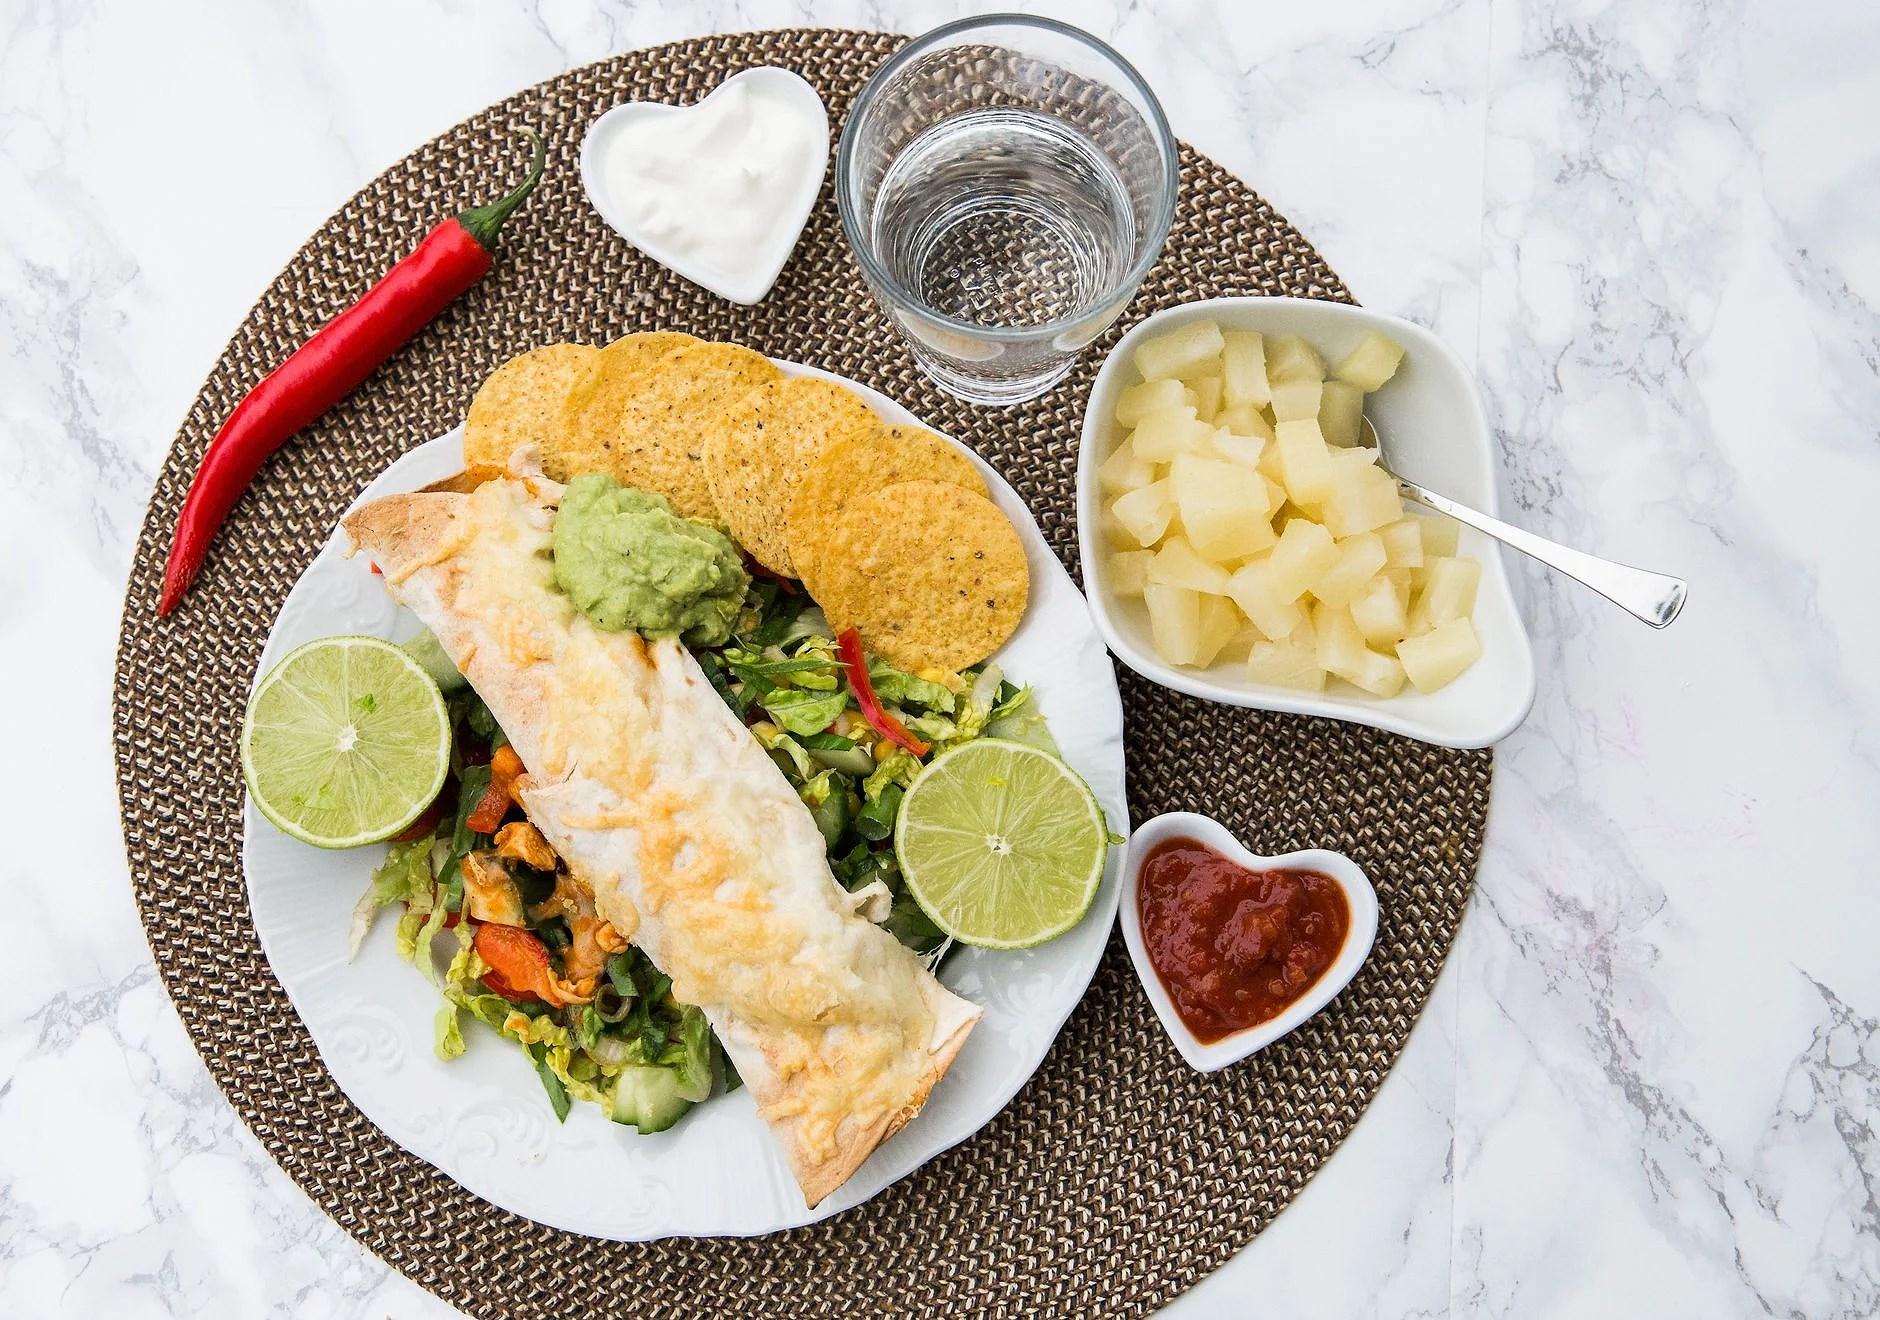 Marielas enchiladas